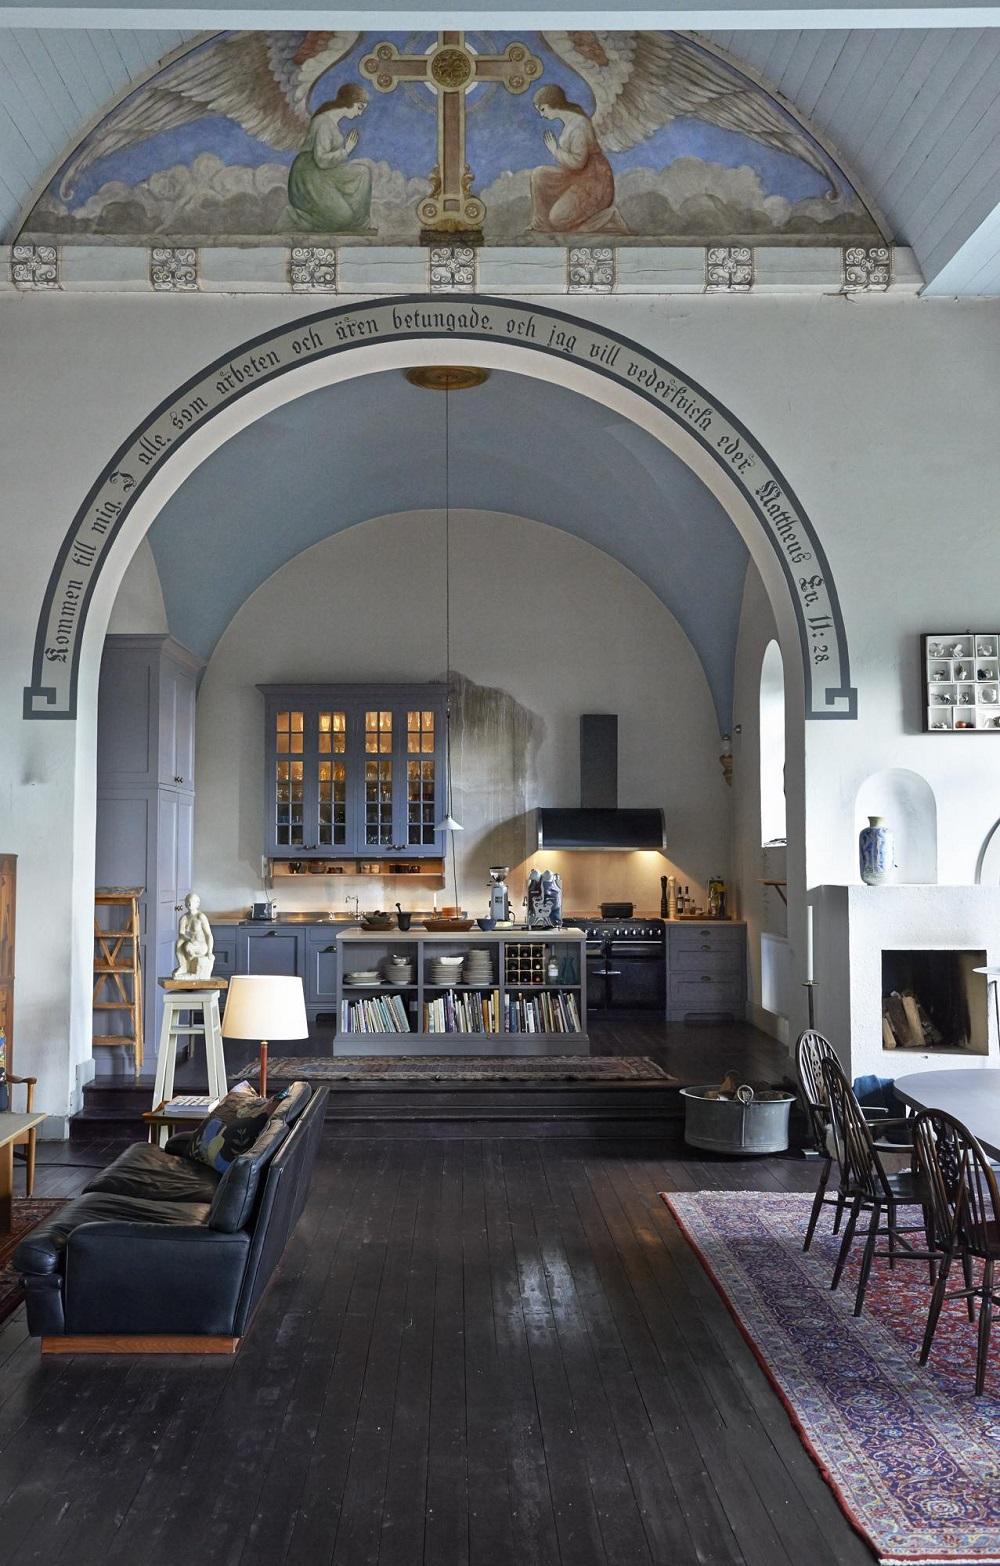 Living In A Church : living, church, Church:, Heavenly, Church, Conversions, NORDROOM